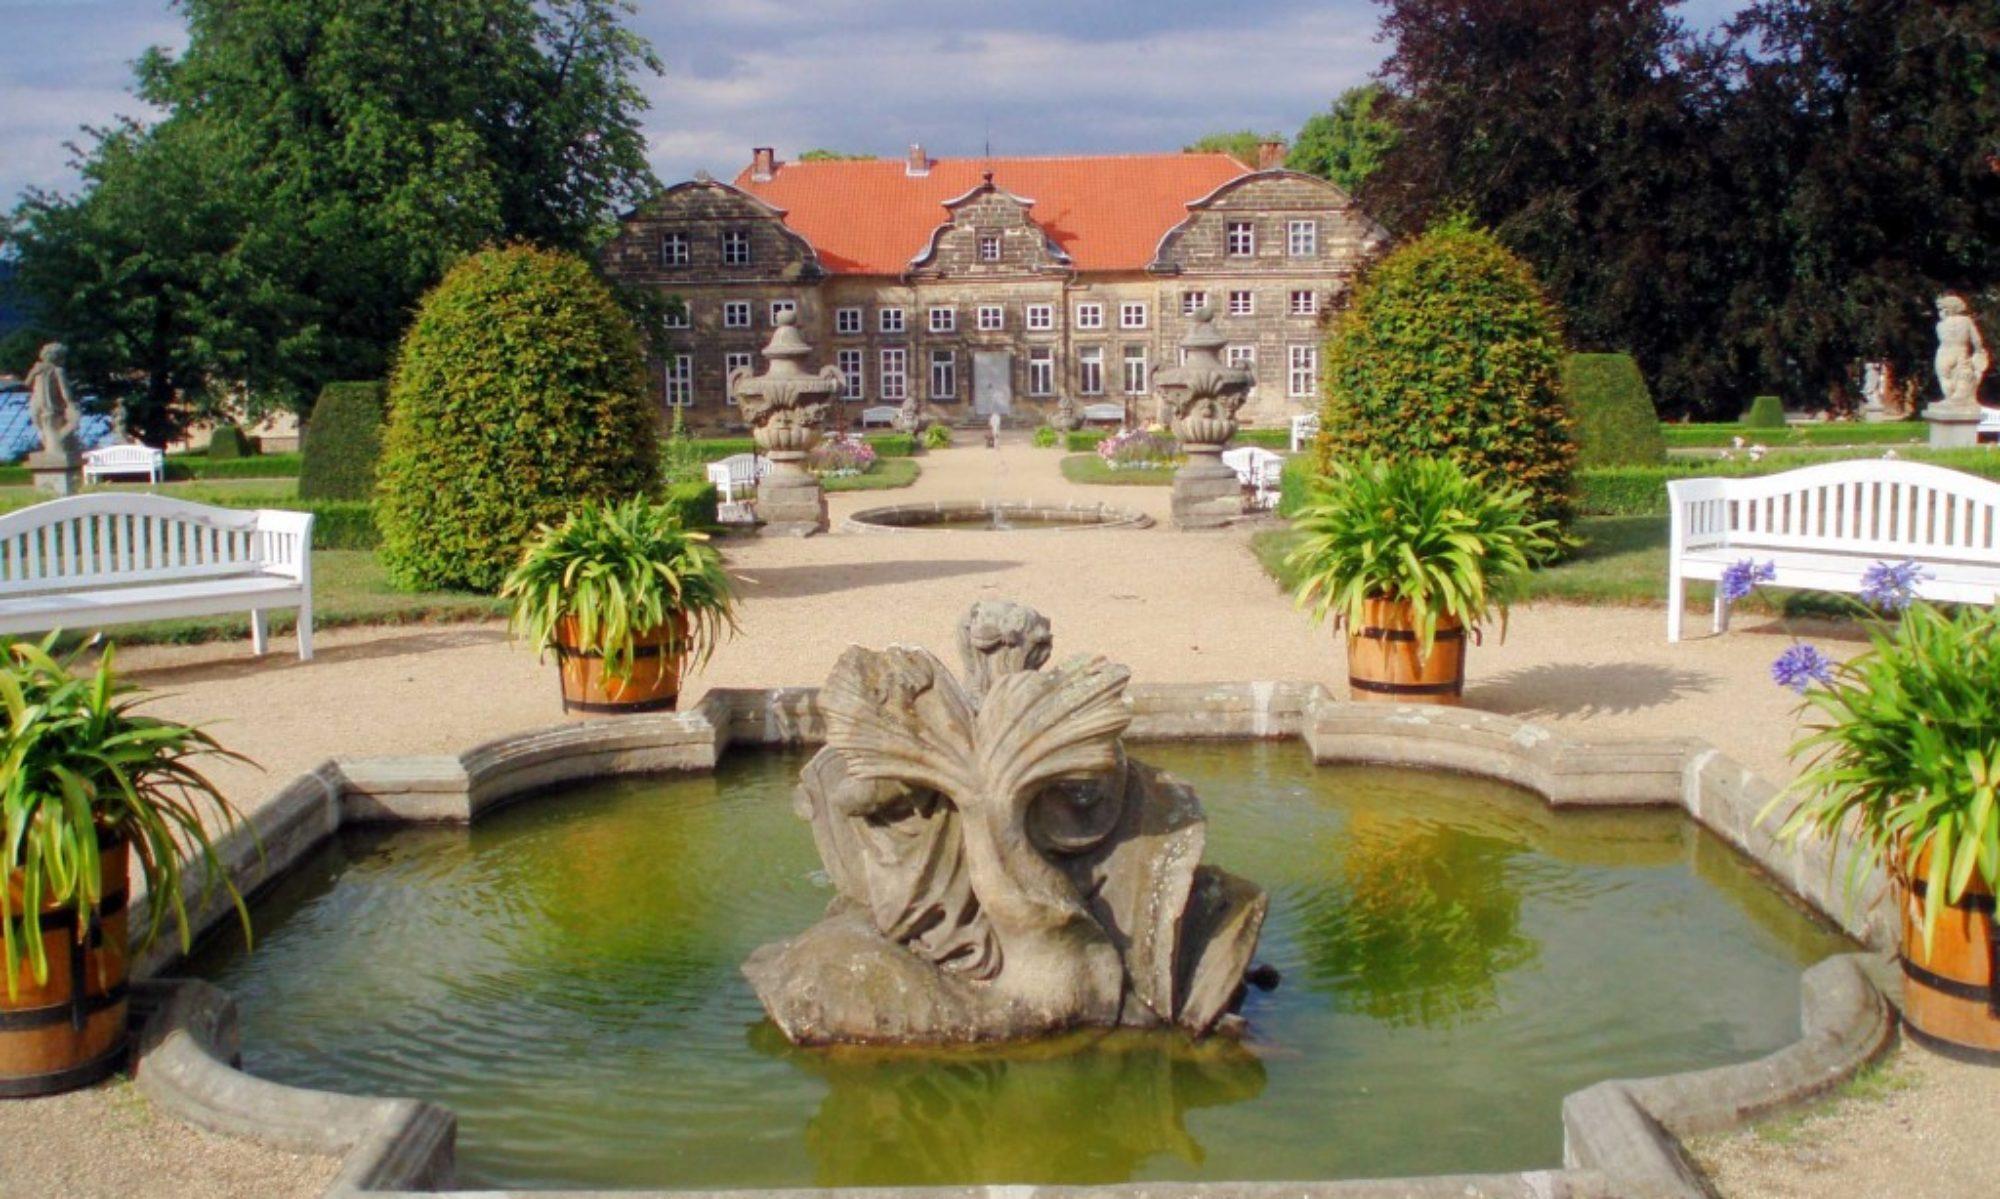 Fête de la musique in Blankenburg (Harz)